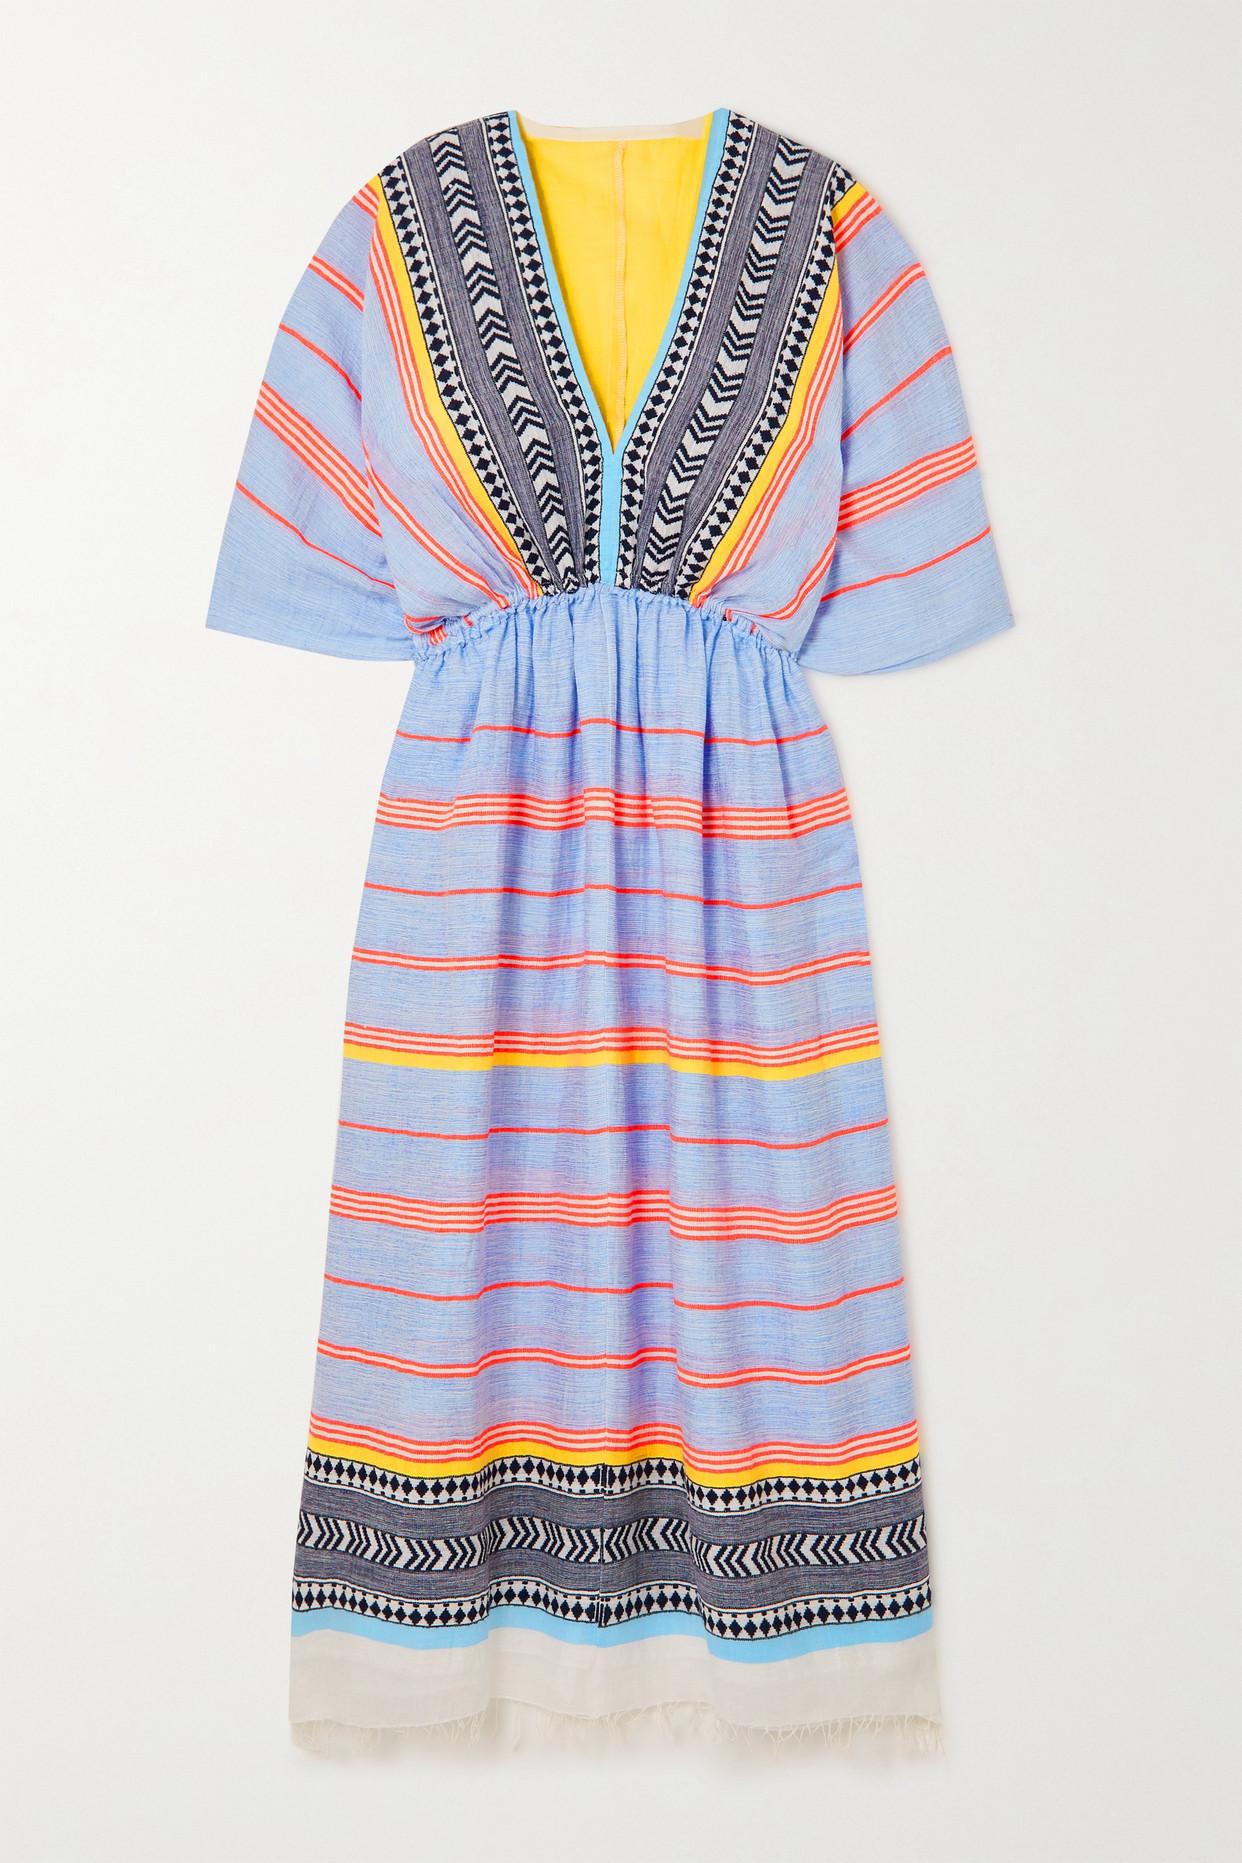 LEMLEM - 【net Sustain】neela 流苏条纹棉质混纺薄纱超长连衣裙 - 蓝色 - small